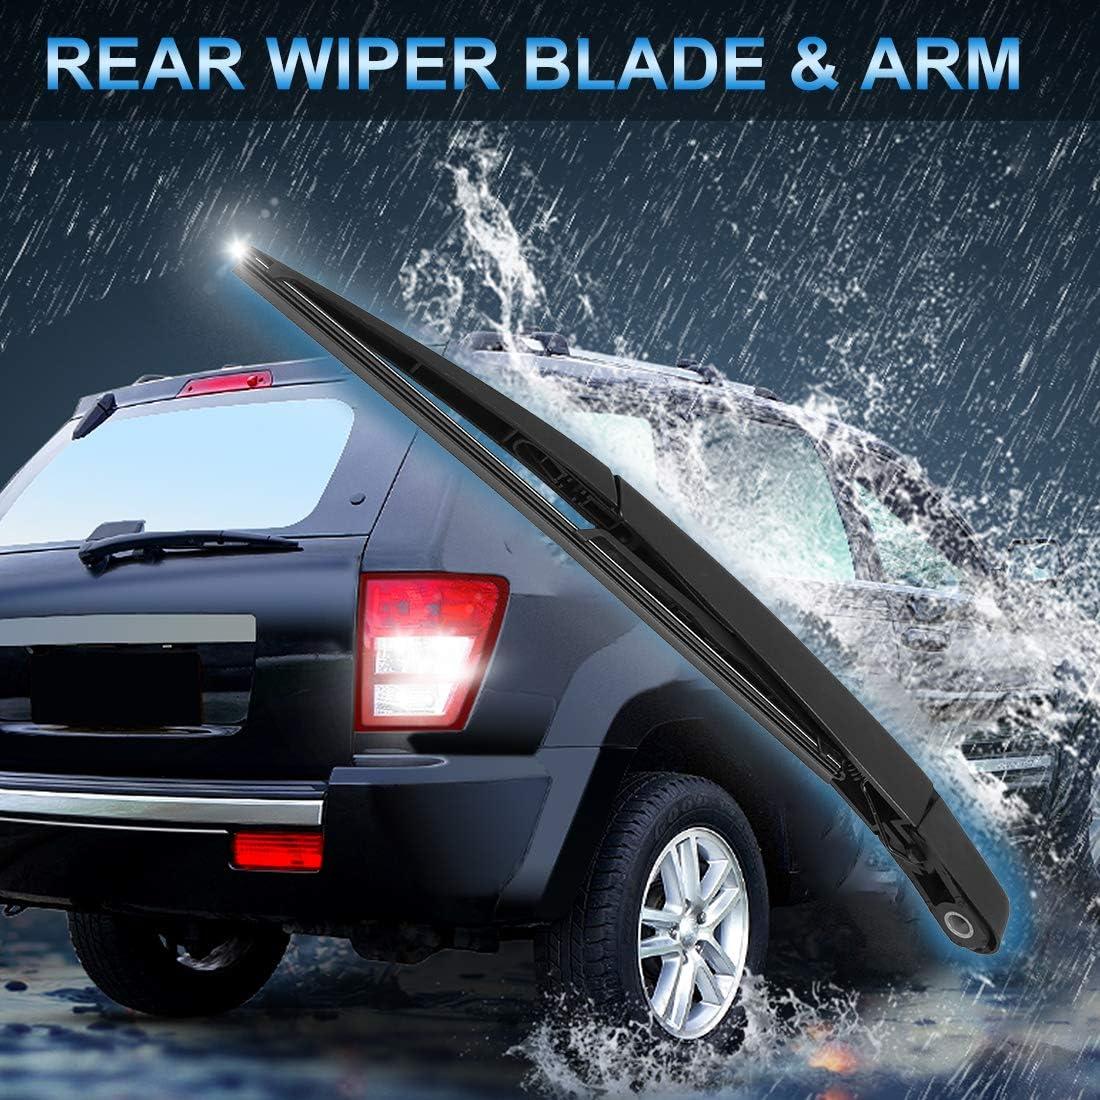 X AUTOHAUX Rear Windshield Wiper Blade Arm Set 305mm 12 Inch for 2006-2007 Mercedes-Benz ML500 Base Sport Utility 4-Door